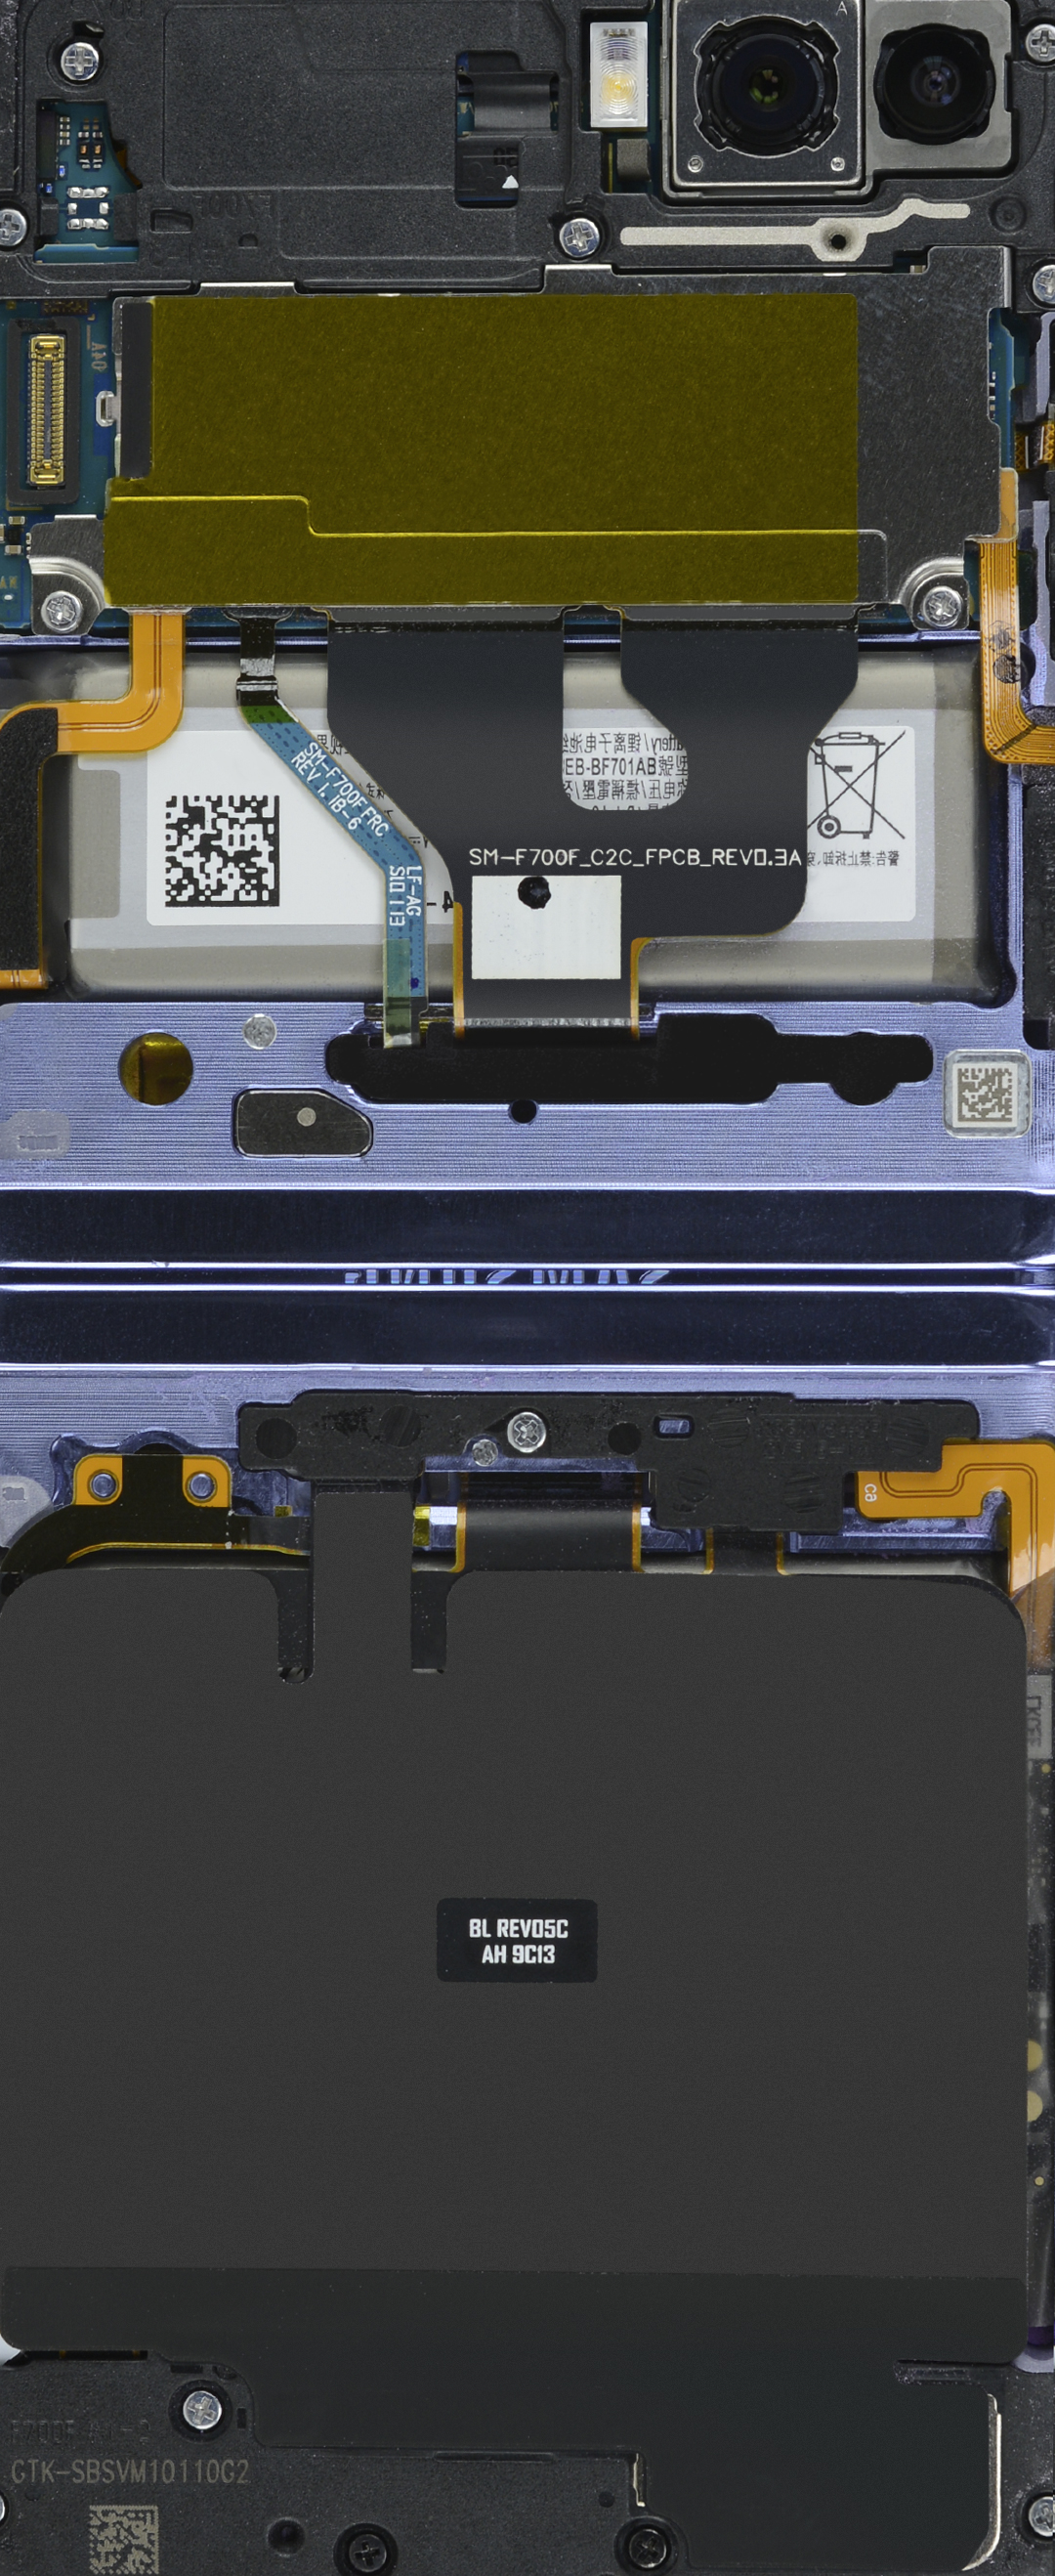 Samsung Galaxy Z Flip internals